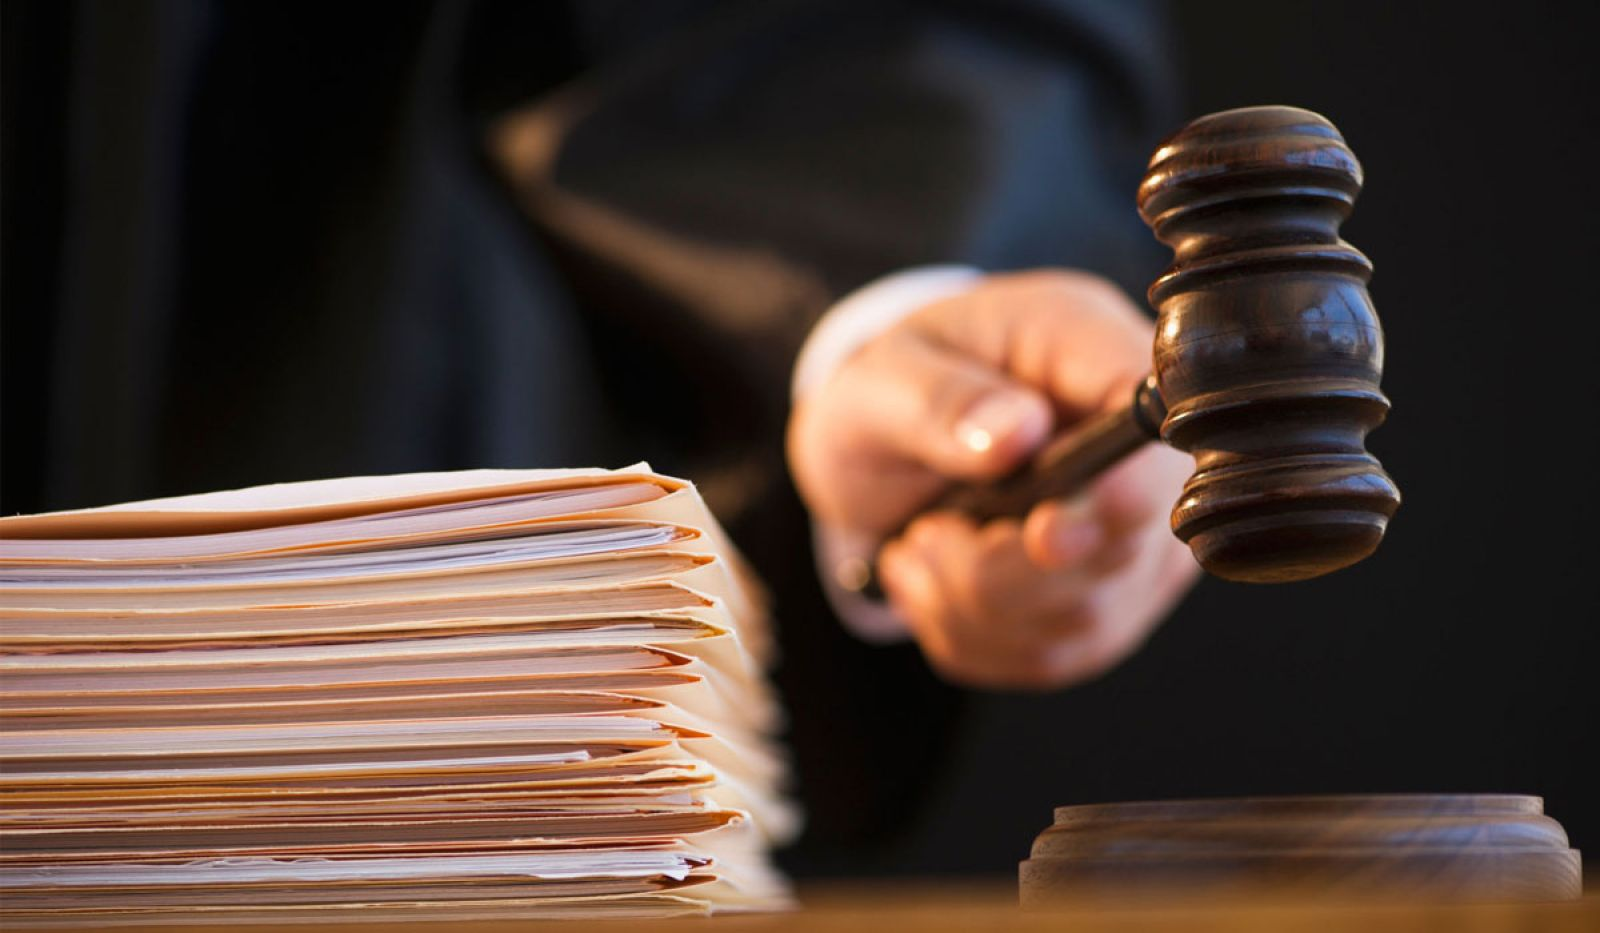 Ликвидация ИП по судебному приговору